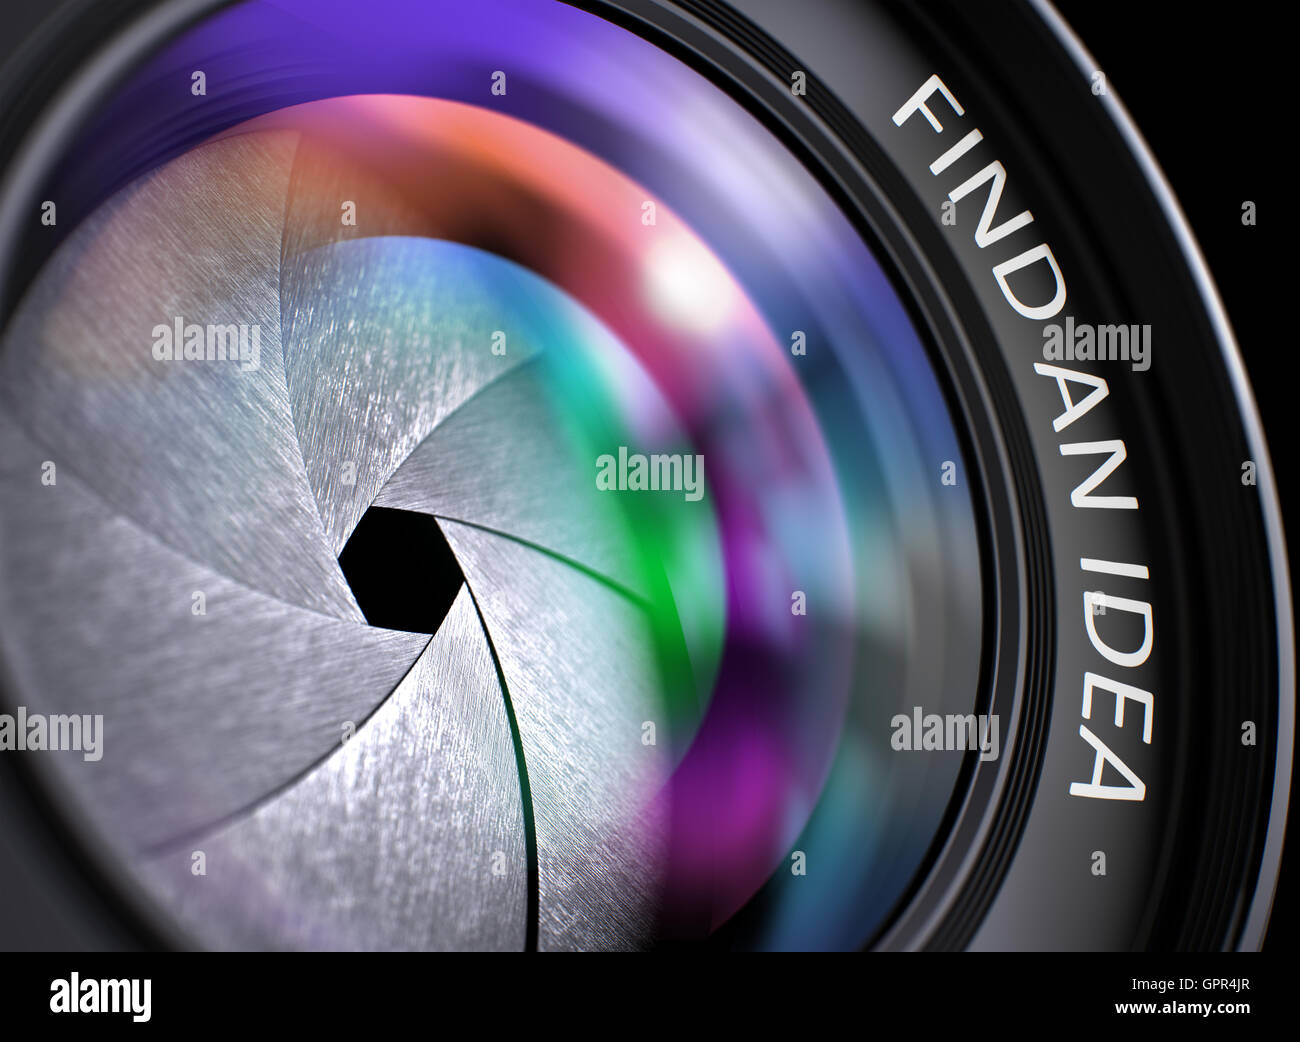 Find An Idea on Photo Lens. Closeup. 3D Render. - Stock Image